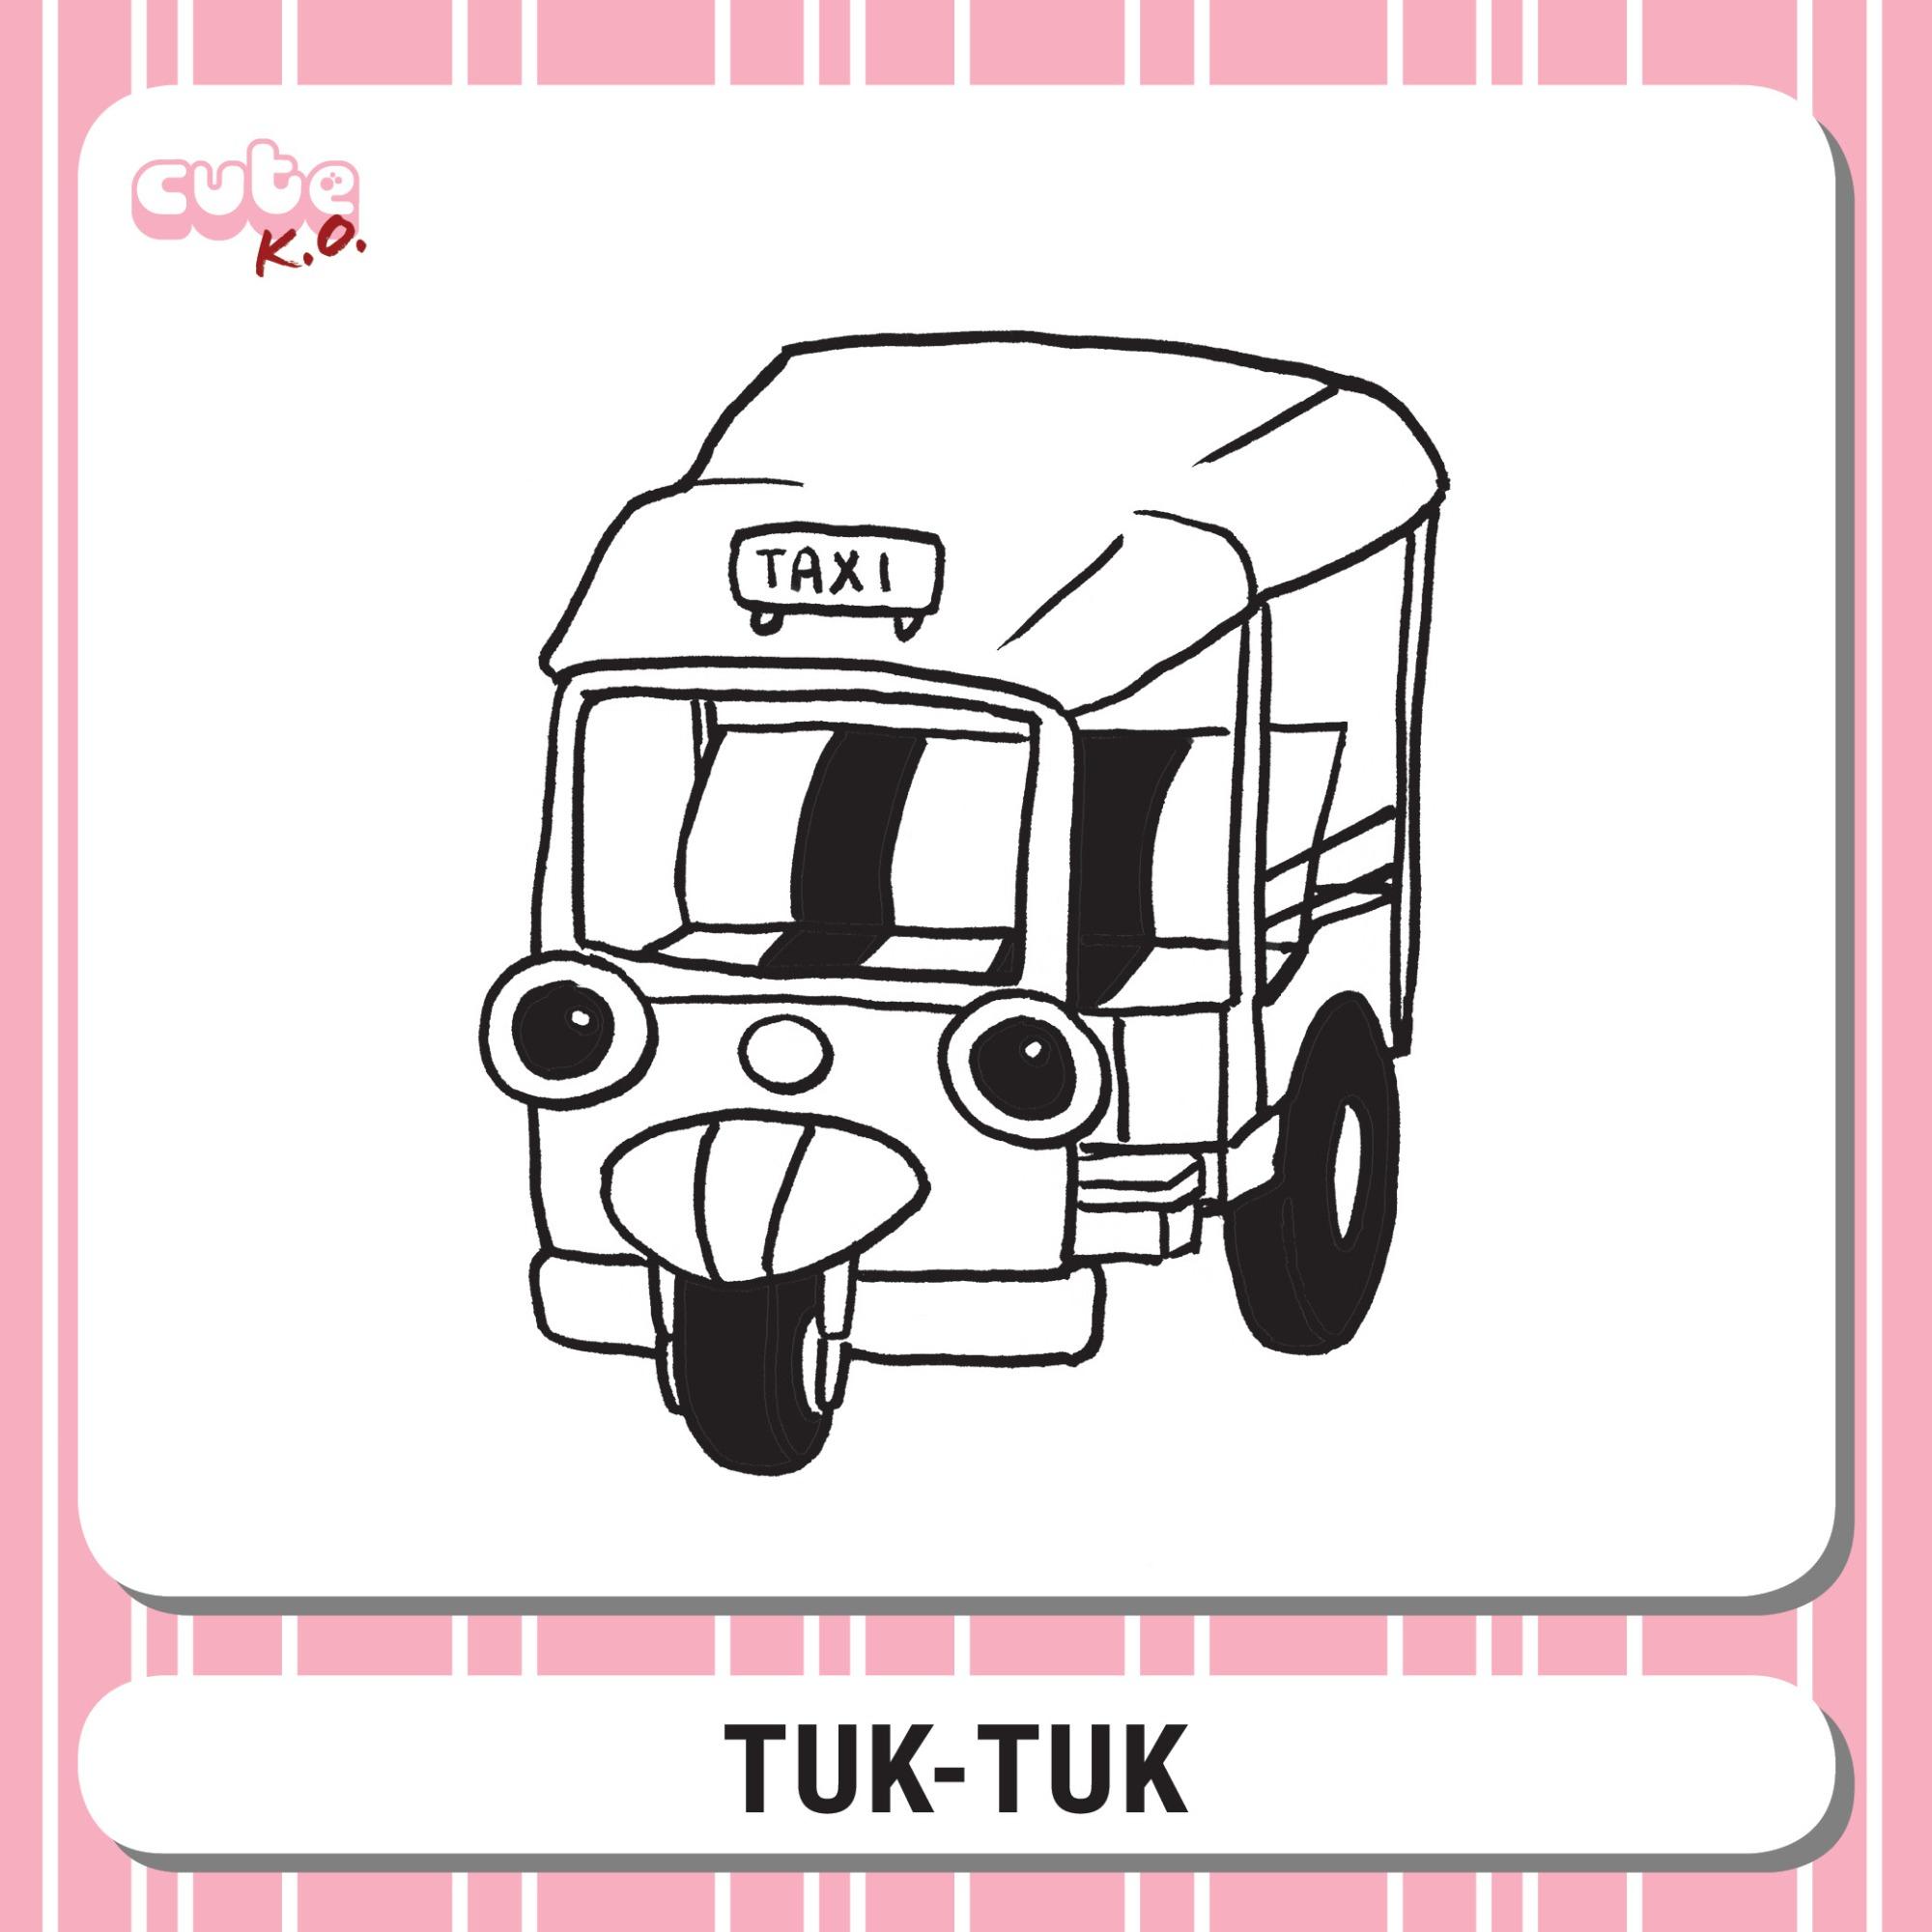 Cute K.O. 2019 Round One: Tuk-Tuk